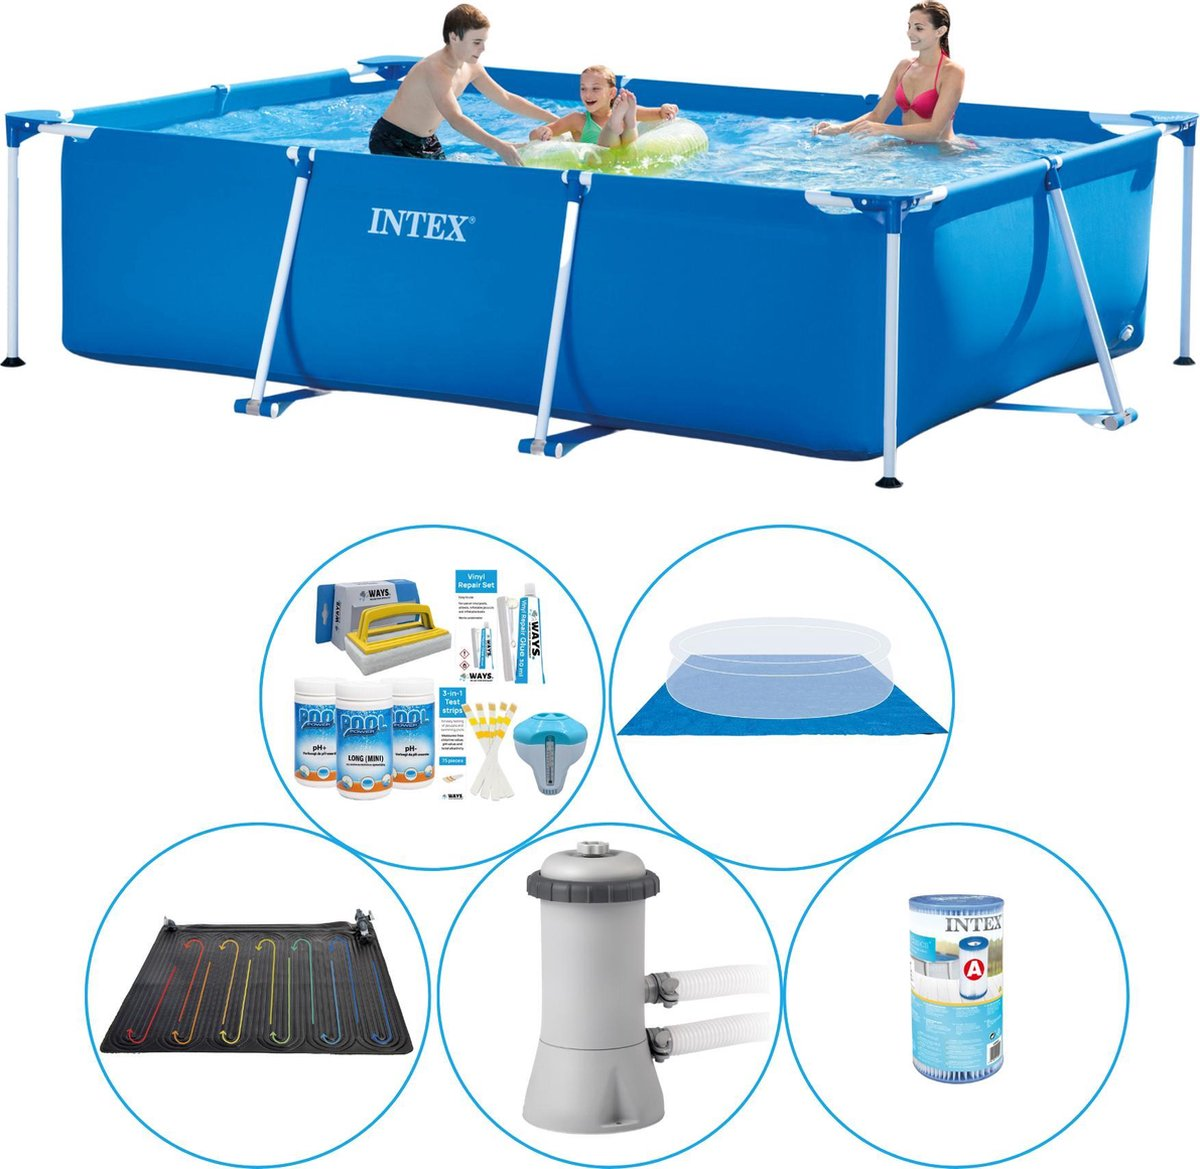 Intex Frame Pool Rechthoekig 300x200x75 cm - 6-delig - Zwembad Plus Accessoires